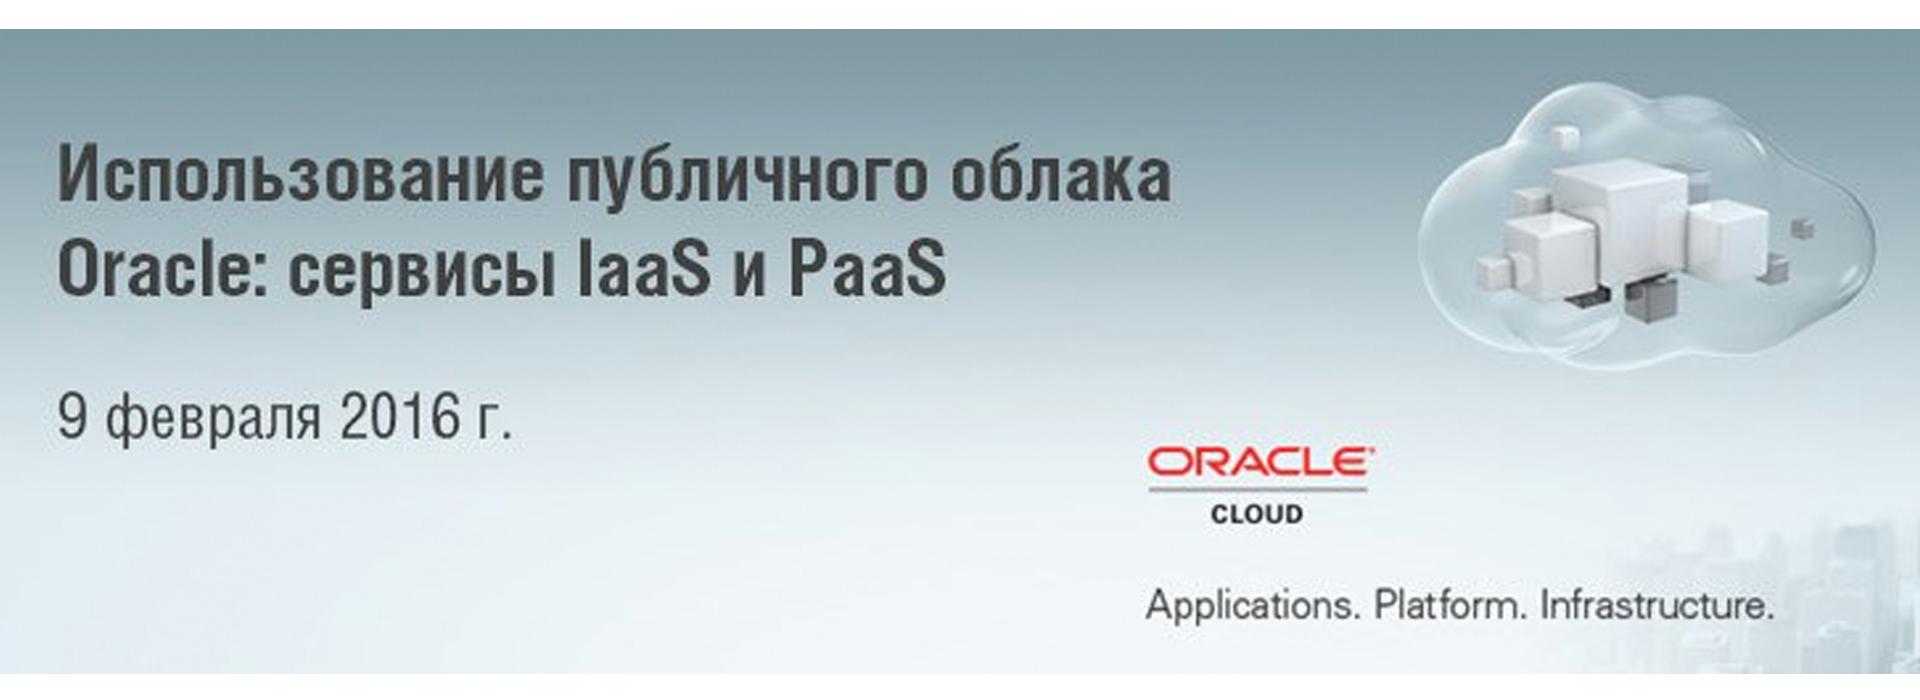 Регистрация на вебинар «Использование публичного облака Oracle: сервисы IaaS и PaaS» - 1